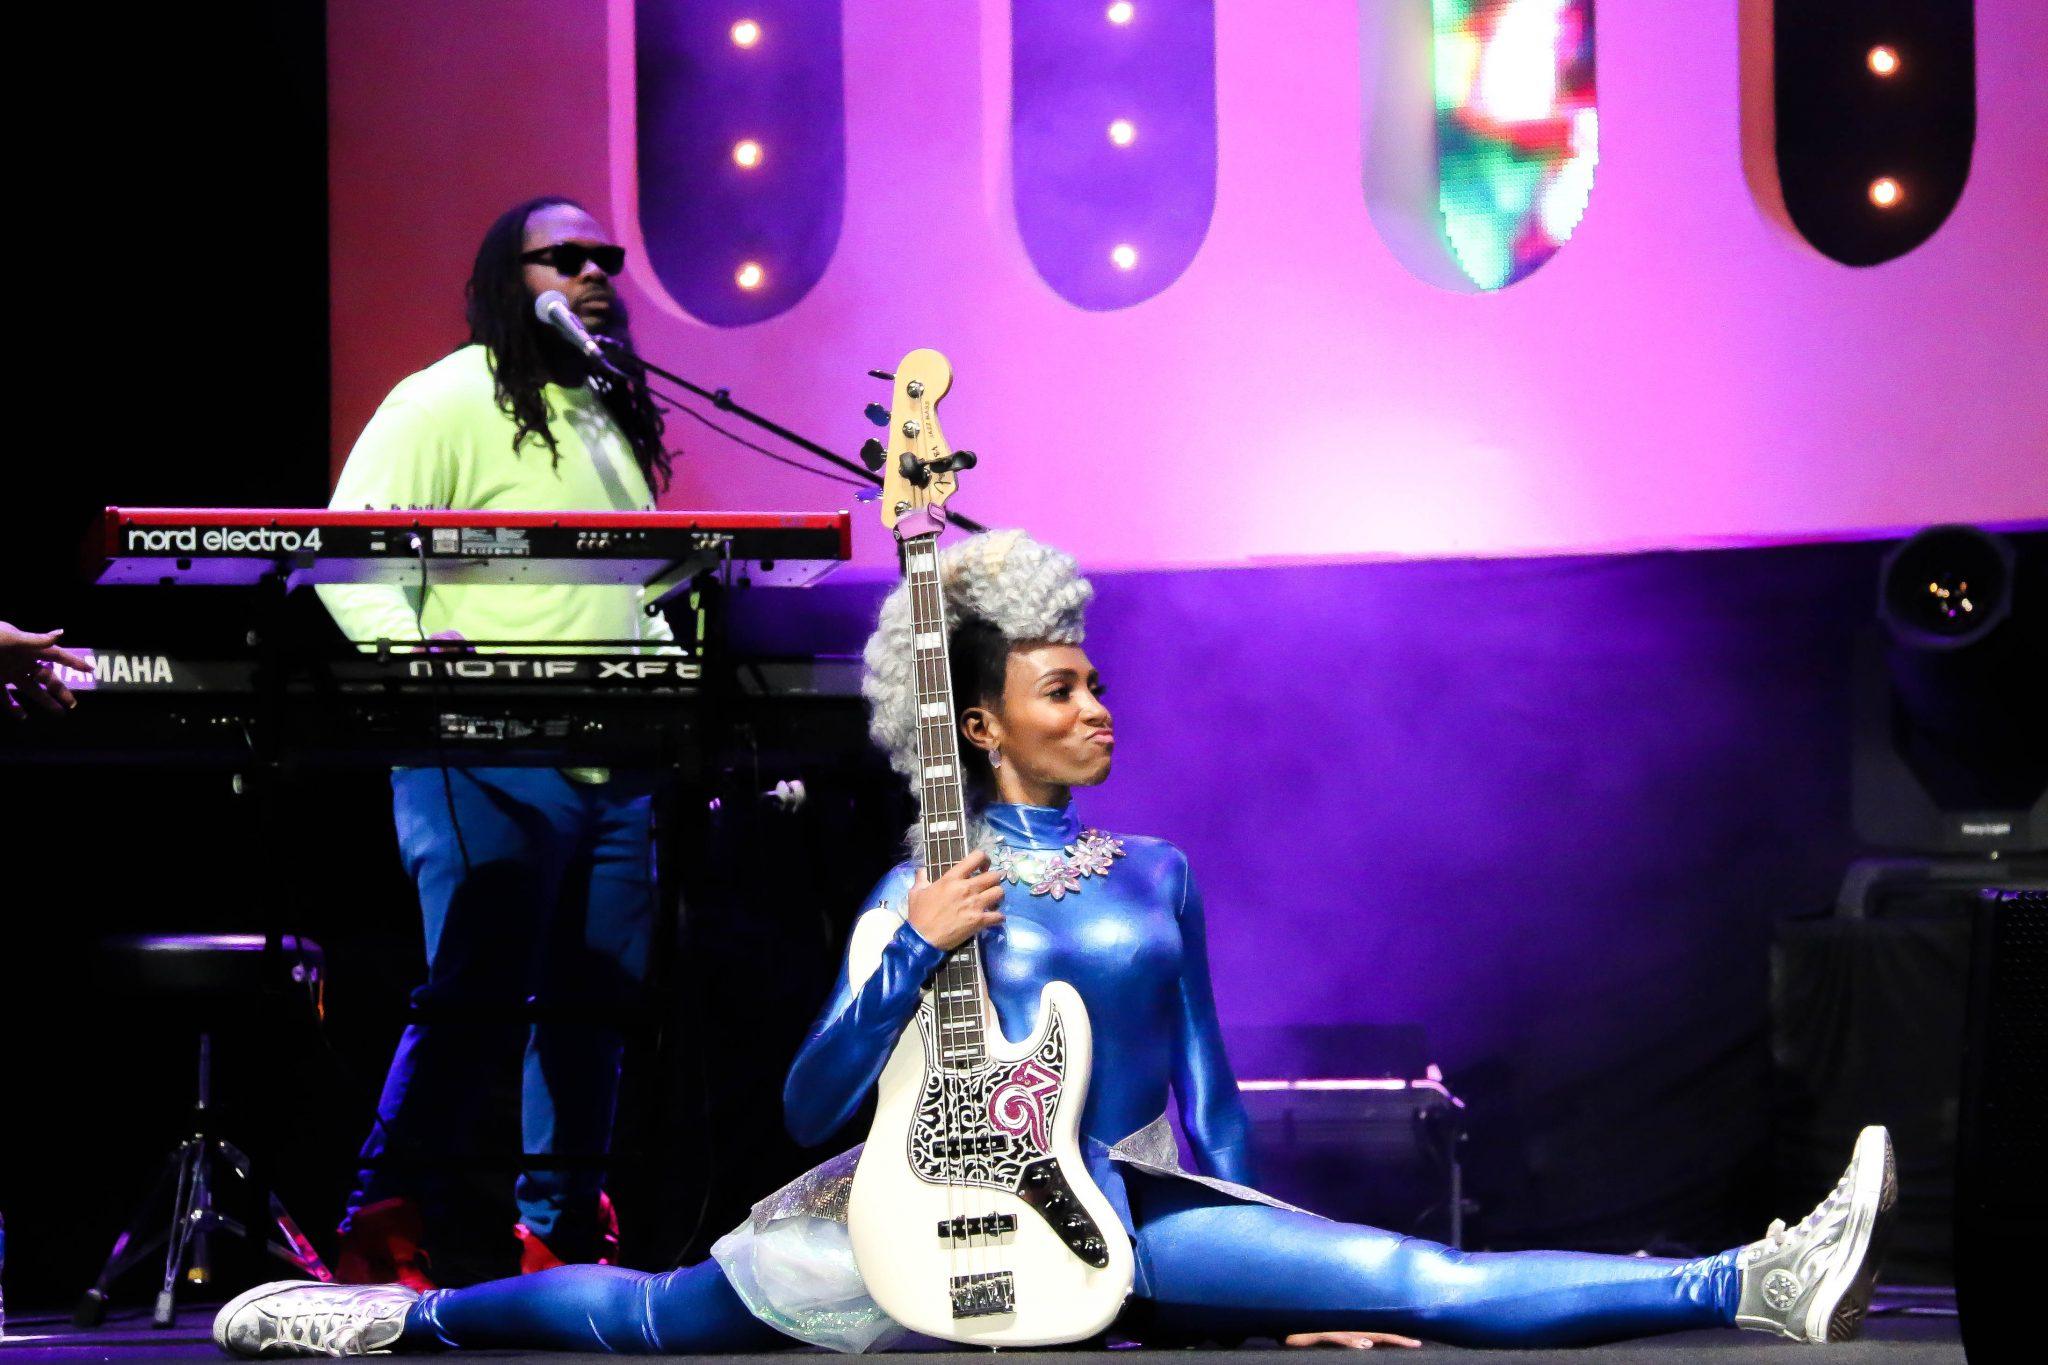 Prestigioso Adquisición fin de semana  The Colorful Nik West Has Stage Presence Like No Other | The Fox Magazine